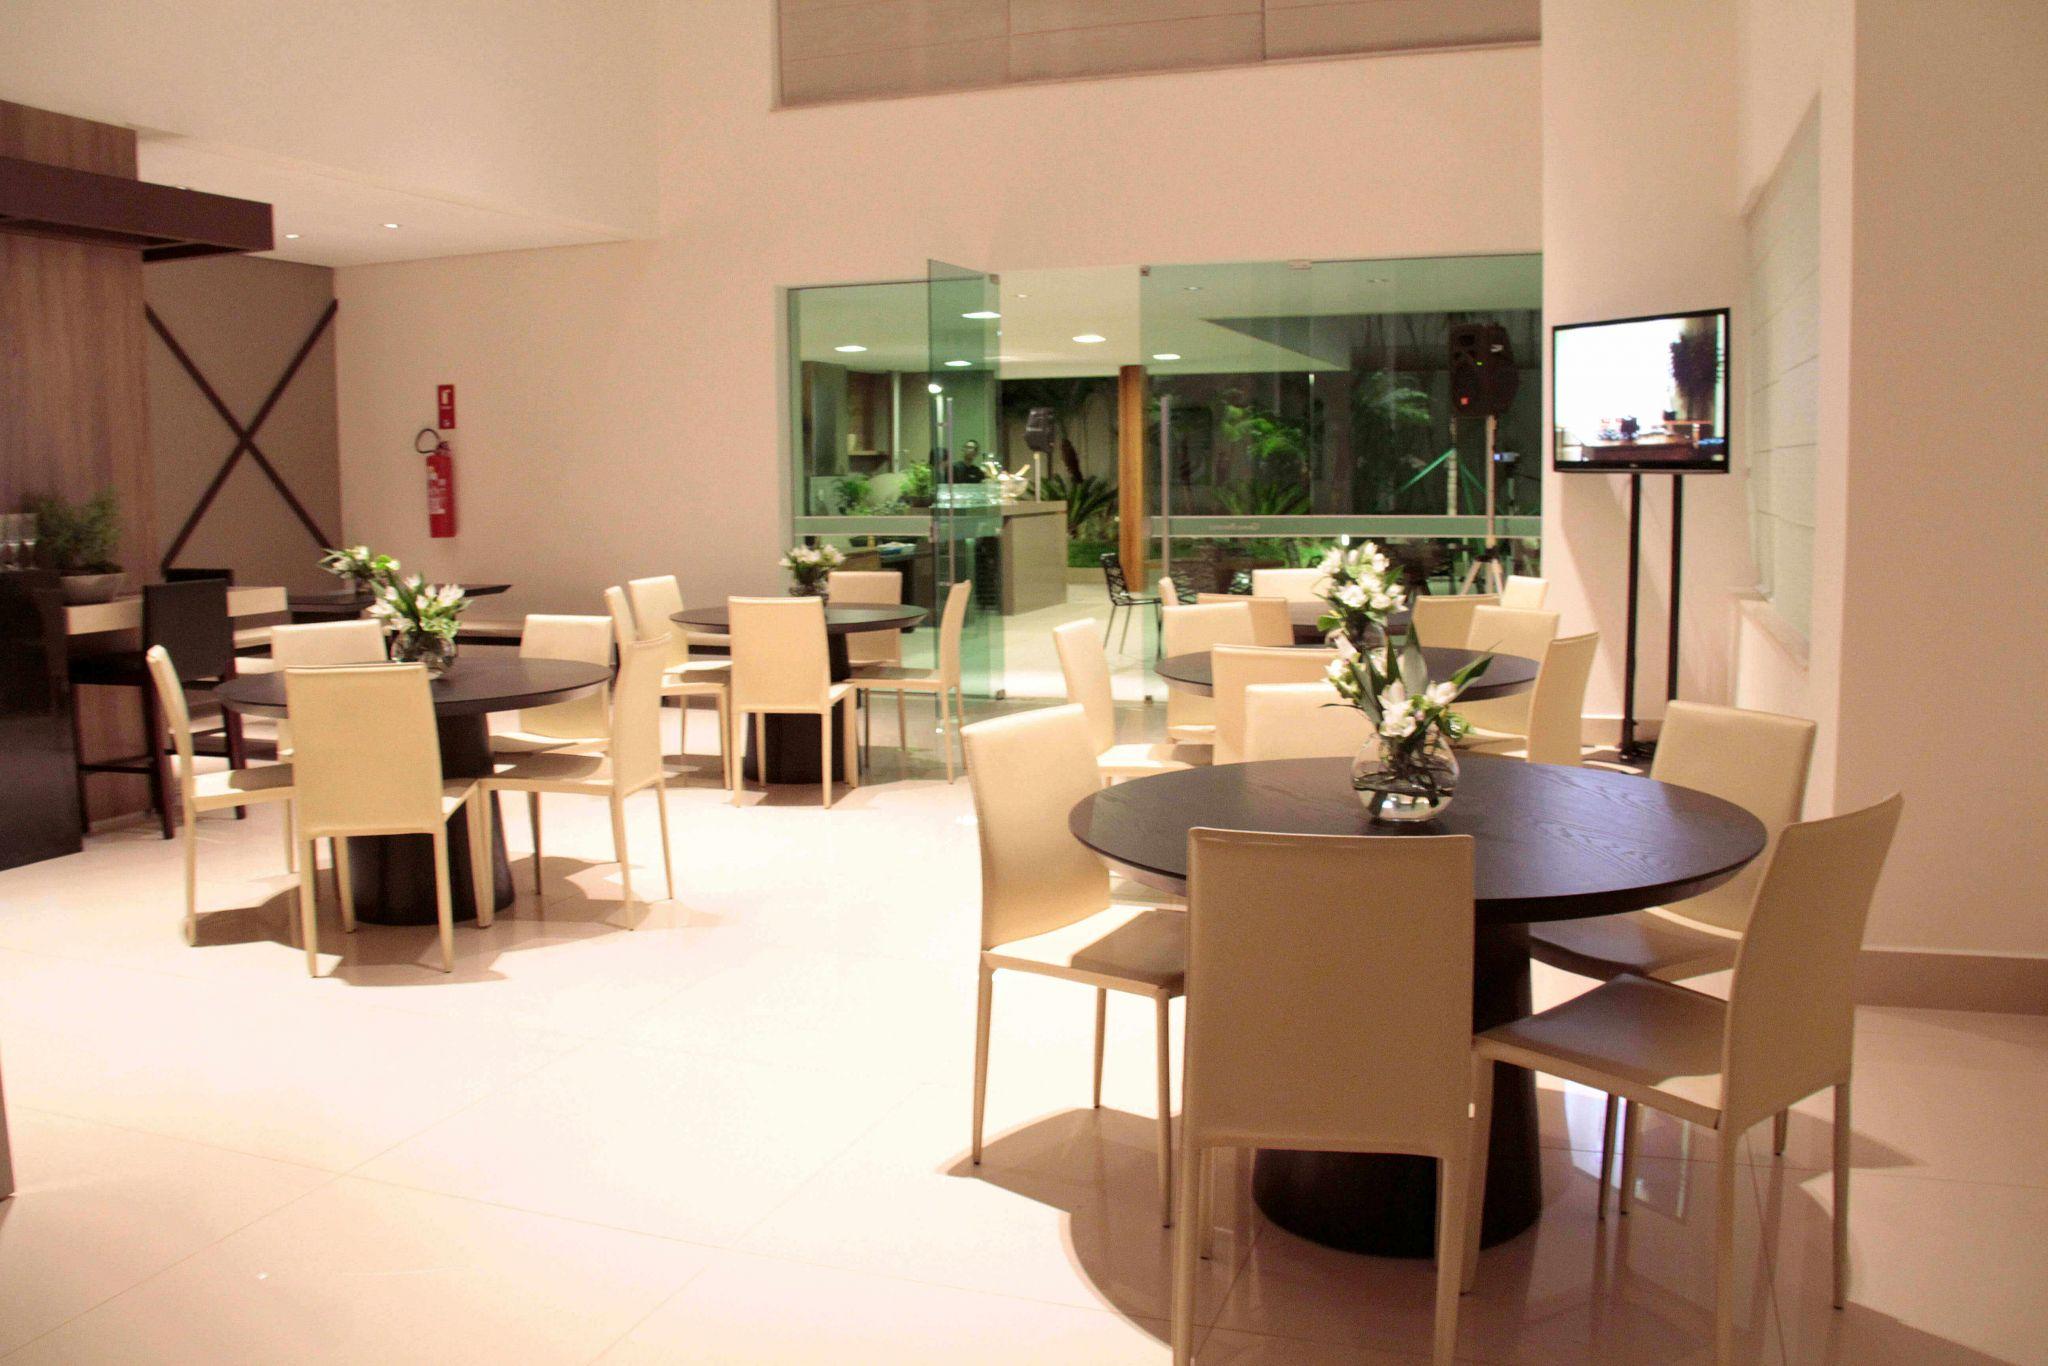 516 - Apto alto padrão Jardim Canadá 320 m²